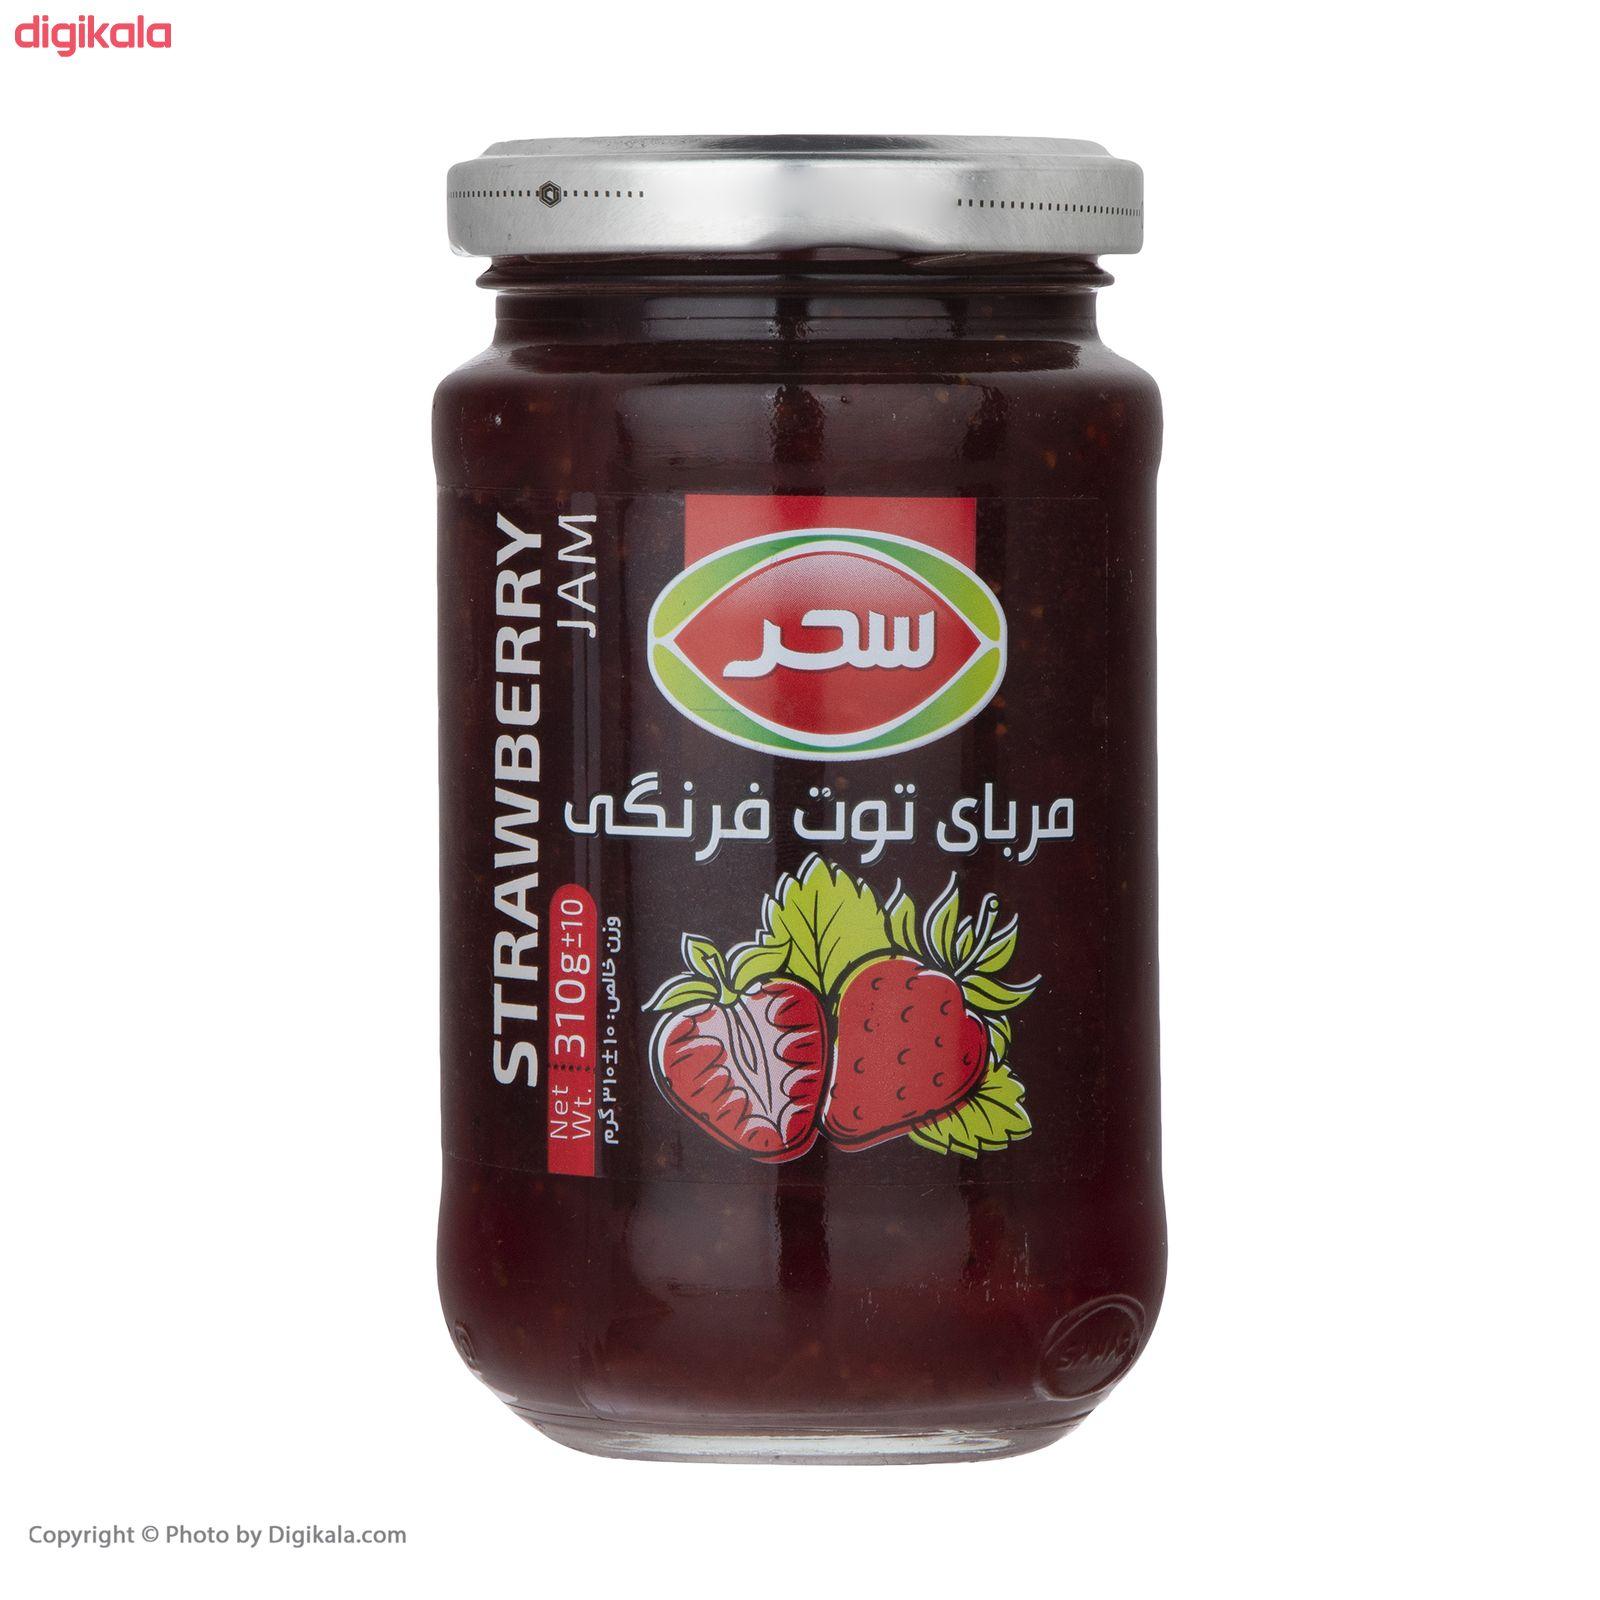 مربای توت فرنگی سحر - 310 گرم  main 1 1